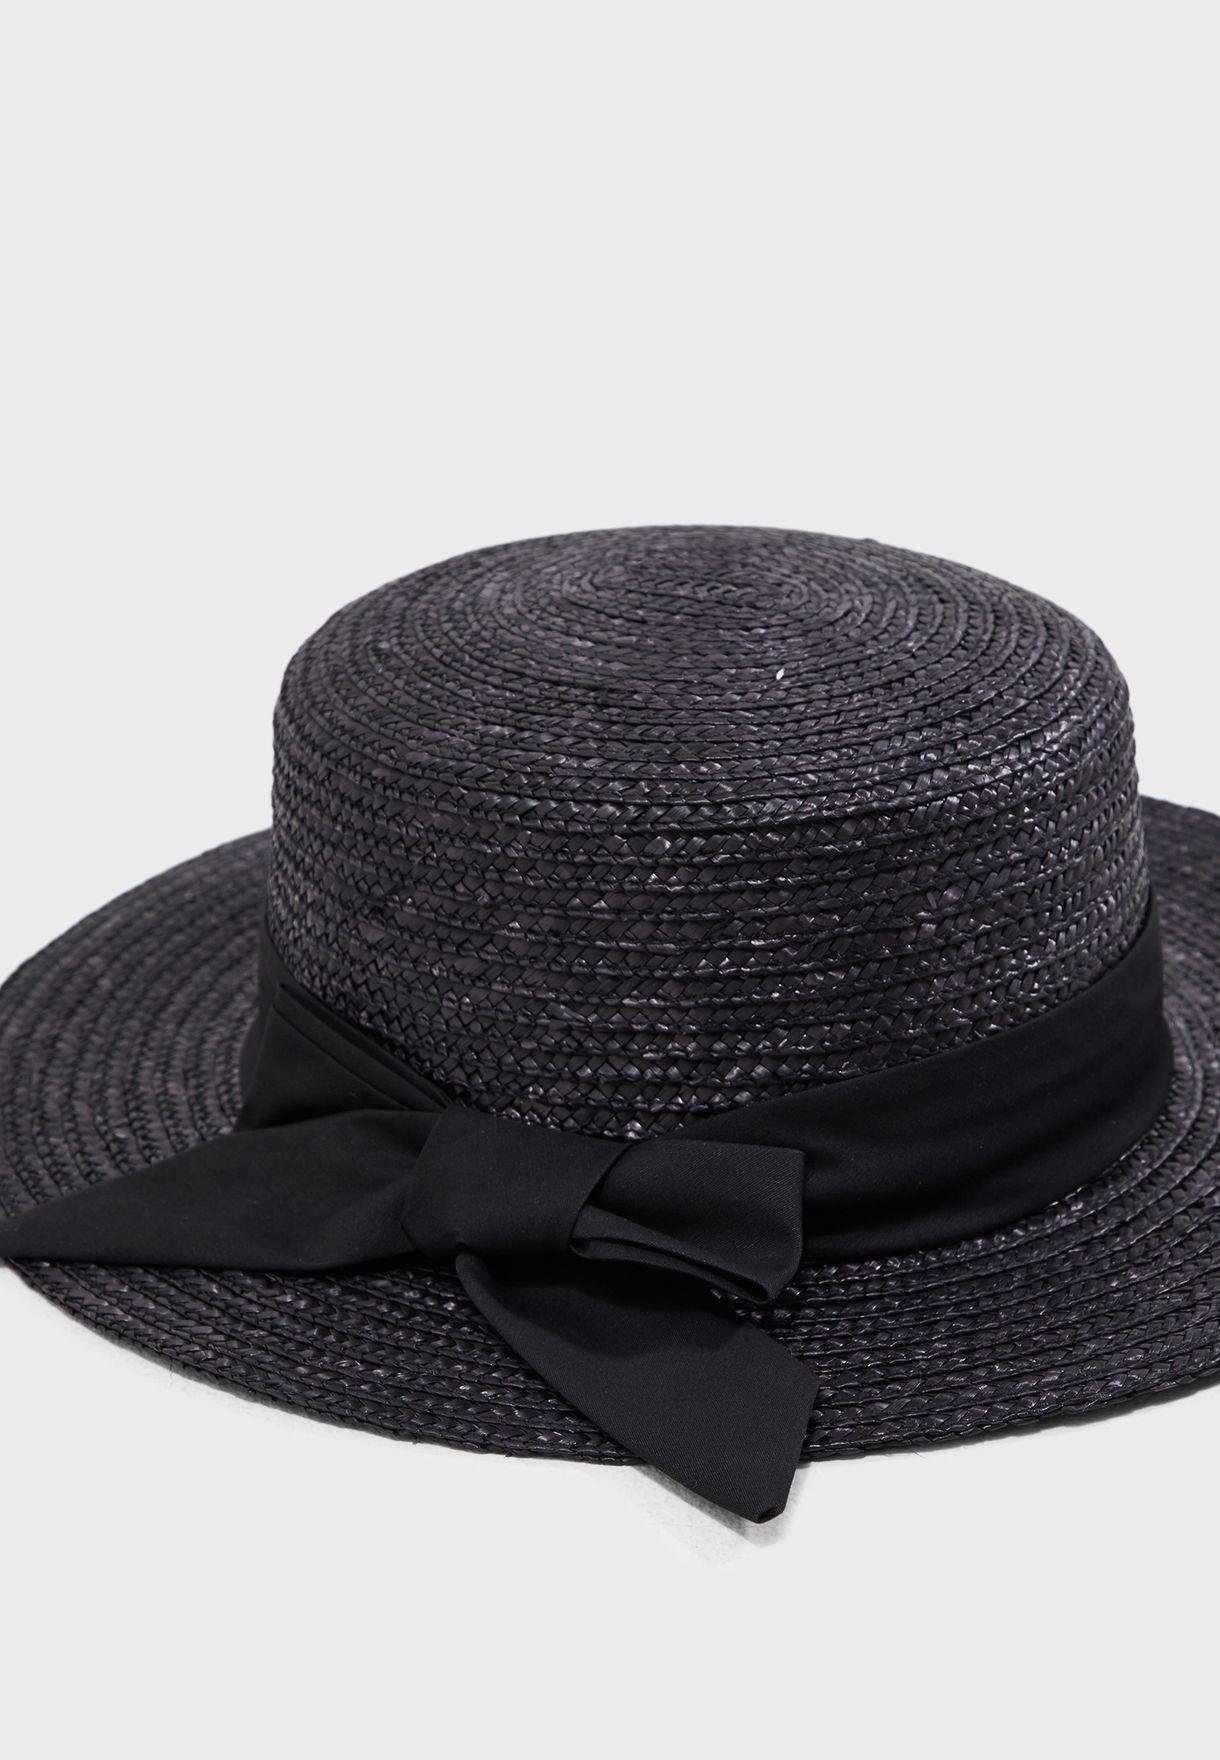 712570b27ee Shop New Look black Straw Boater Hat 617199601 for Women in Oman ...